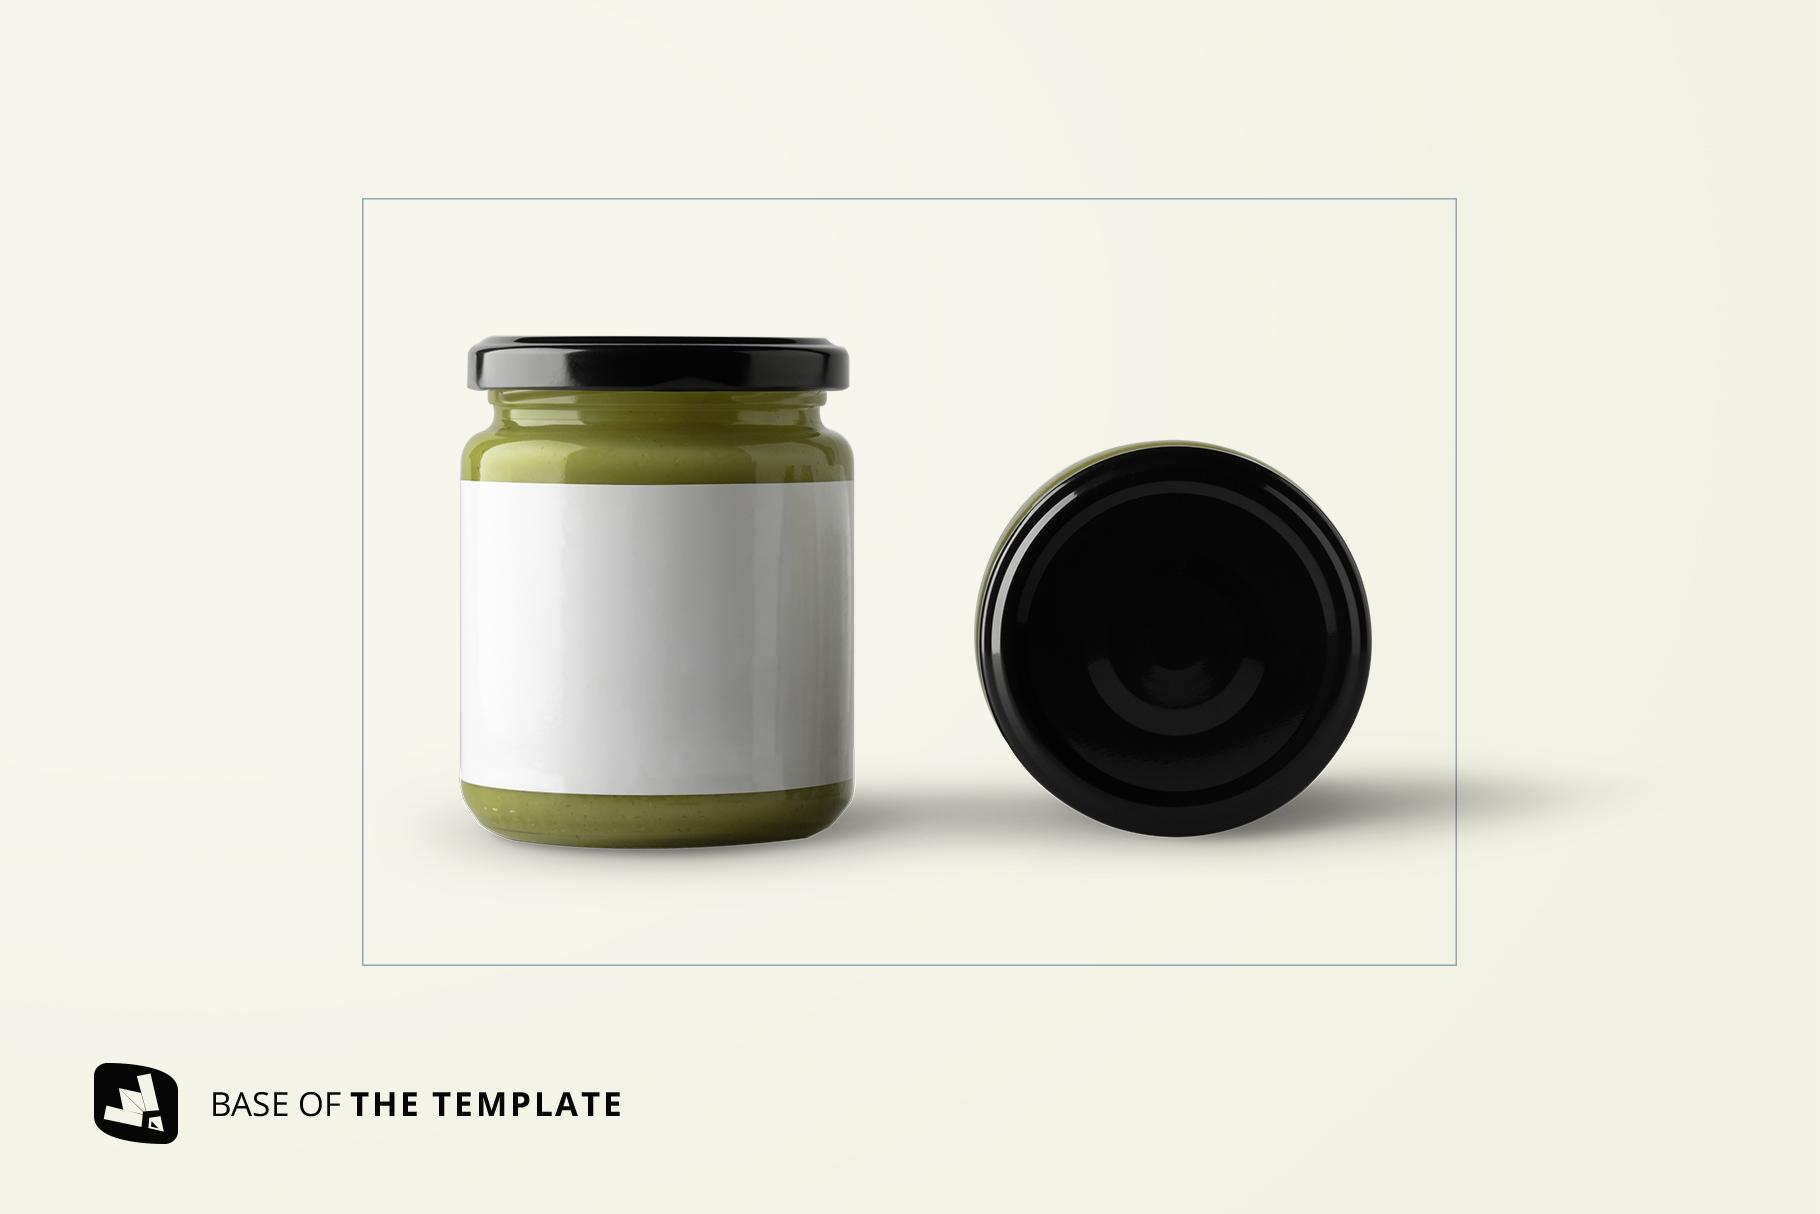 base image of the organic baby food packaging mockup